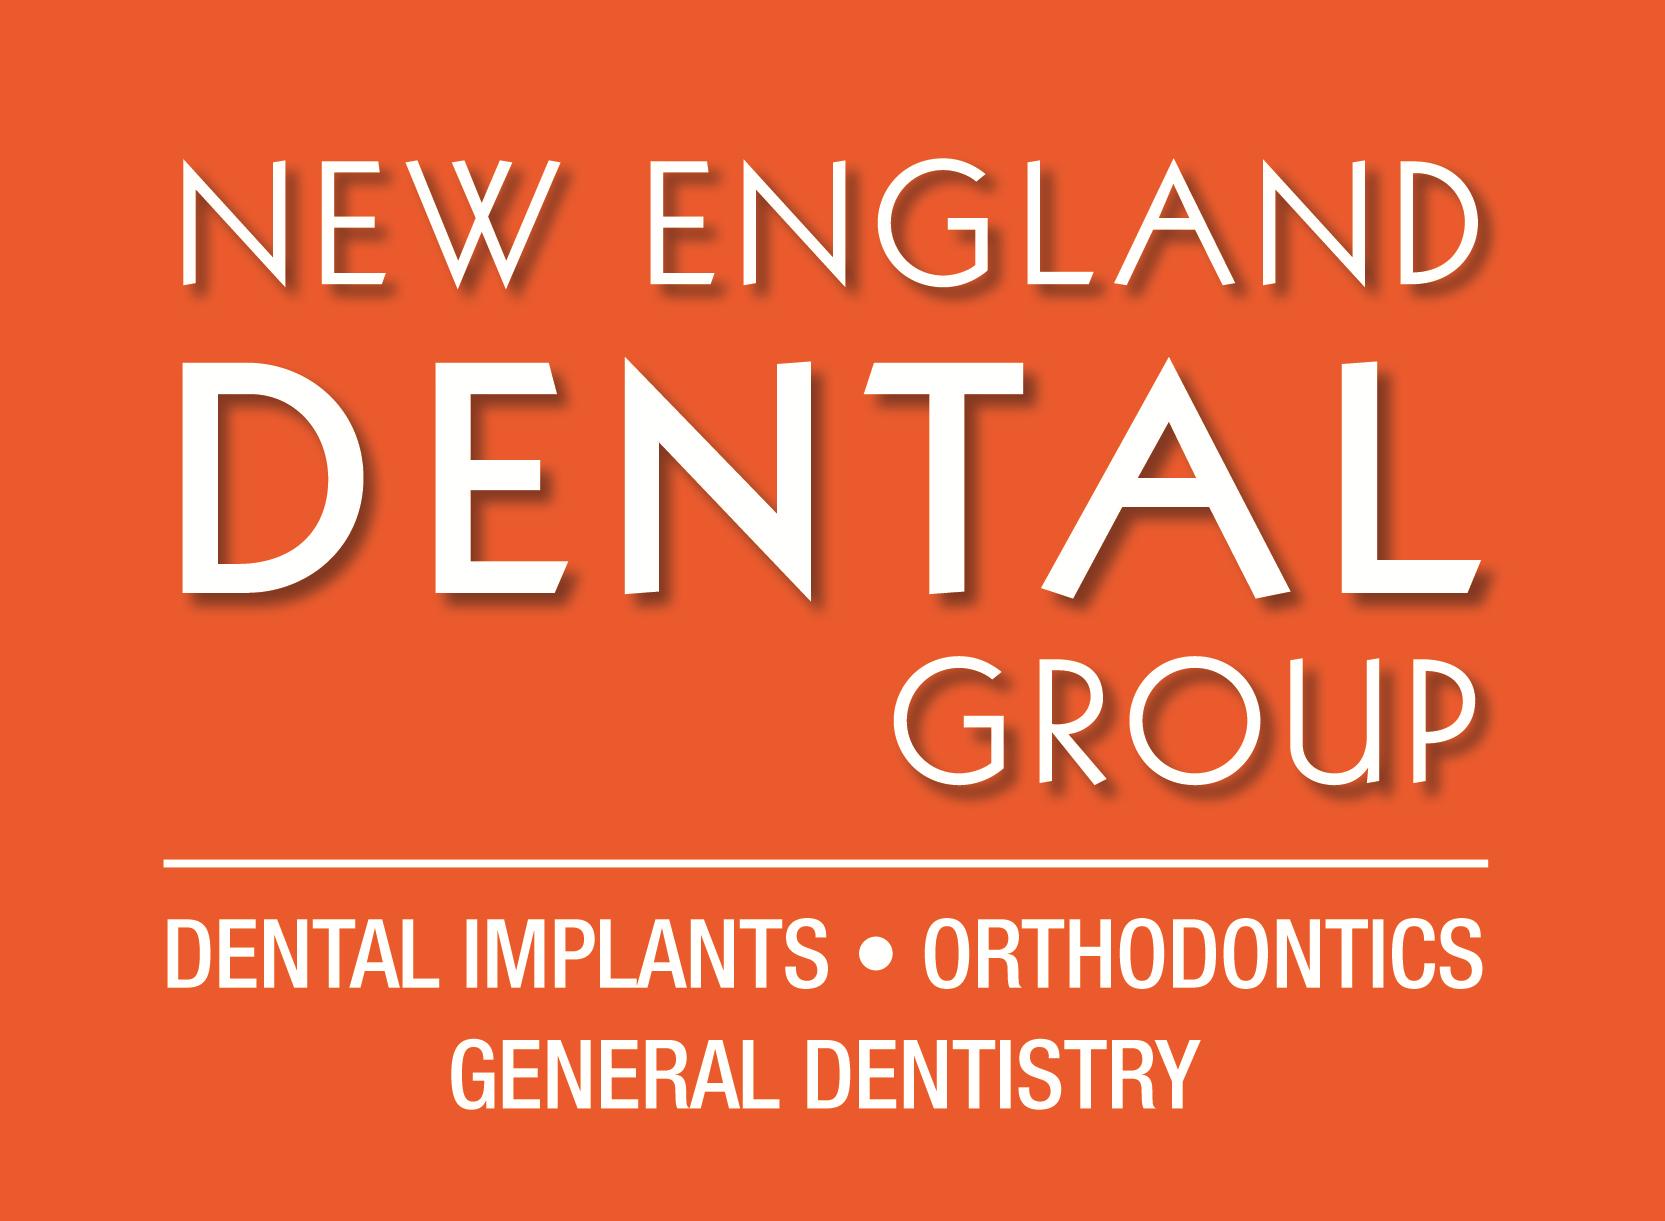 New England Dental Group logo